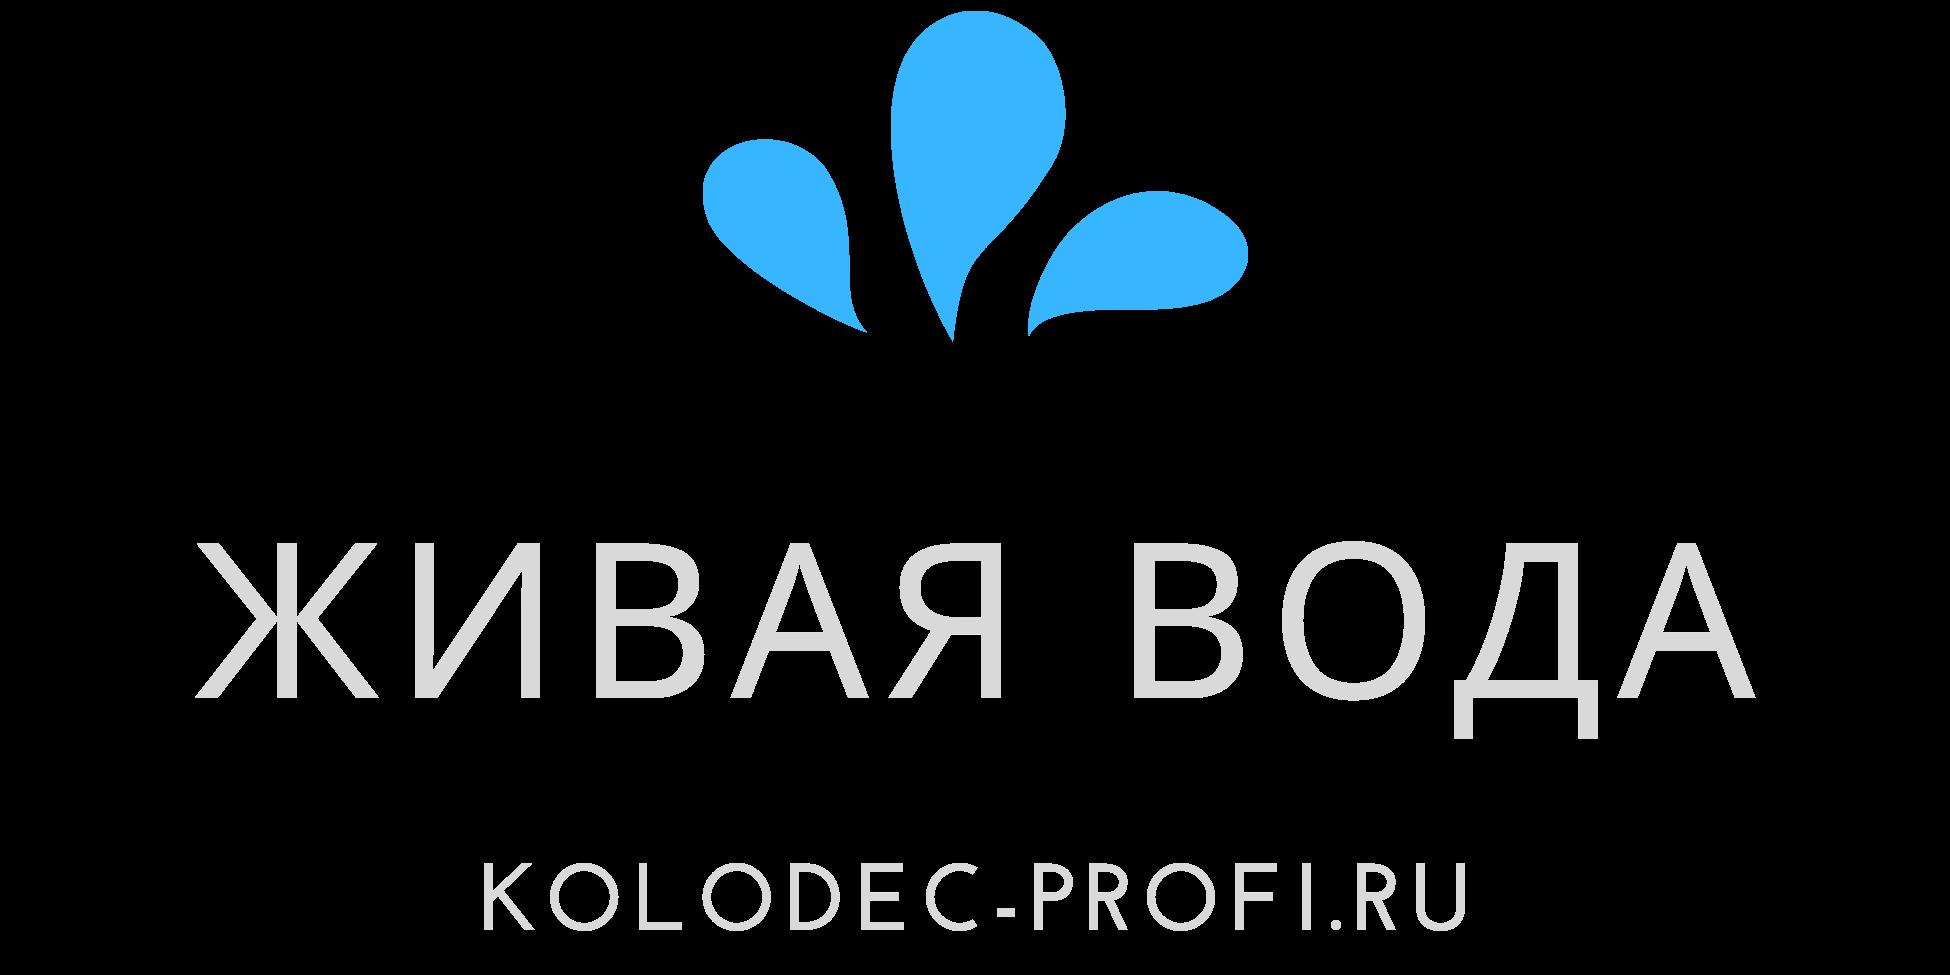 kolodec-profi.ru